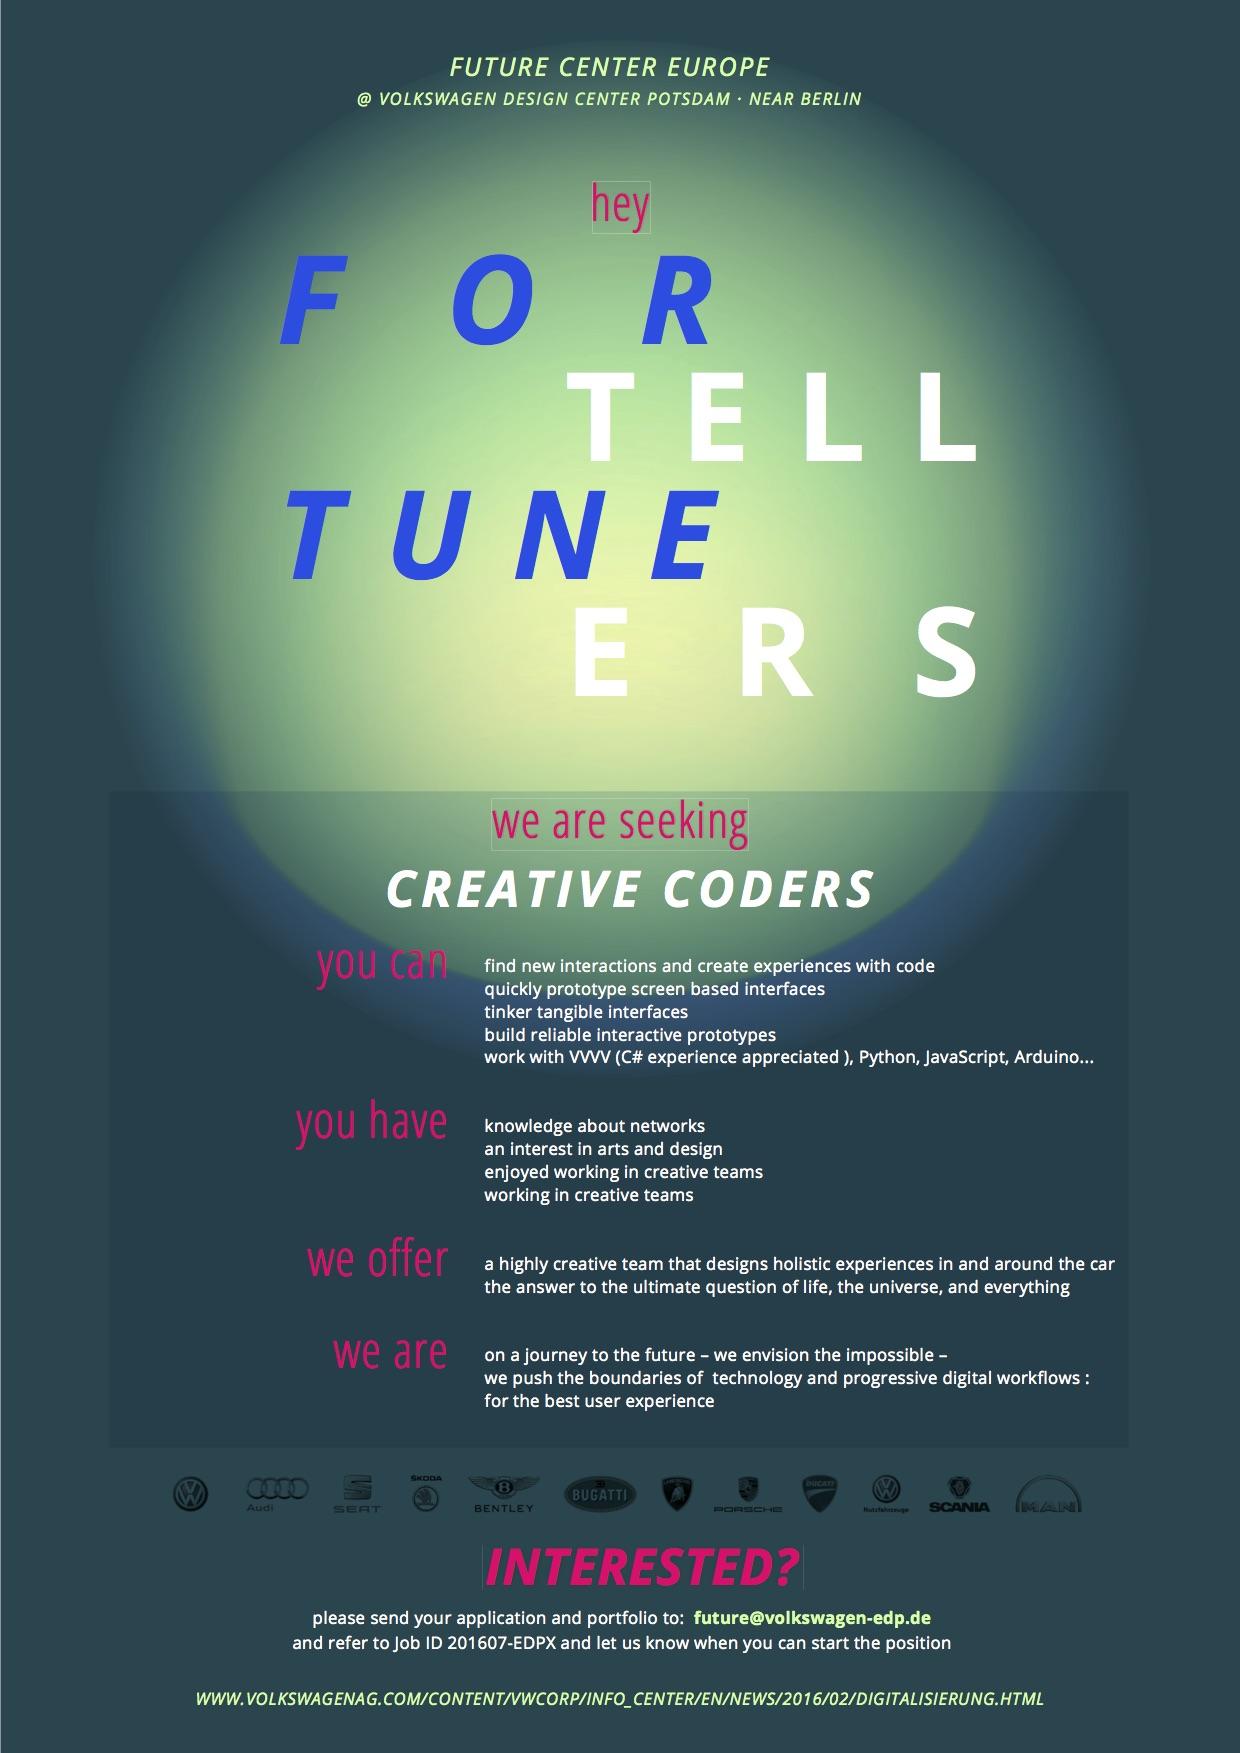 Creative Coders wanted